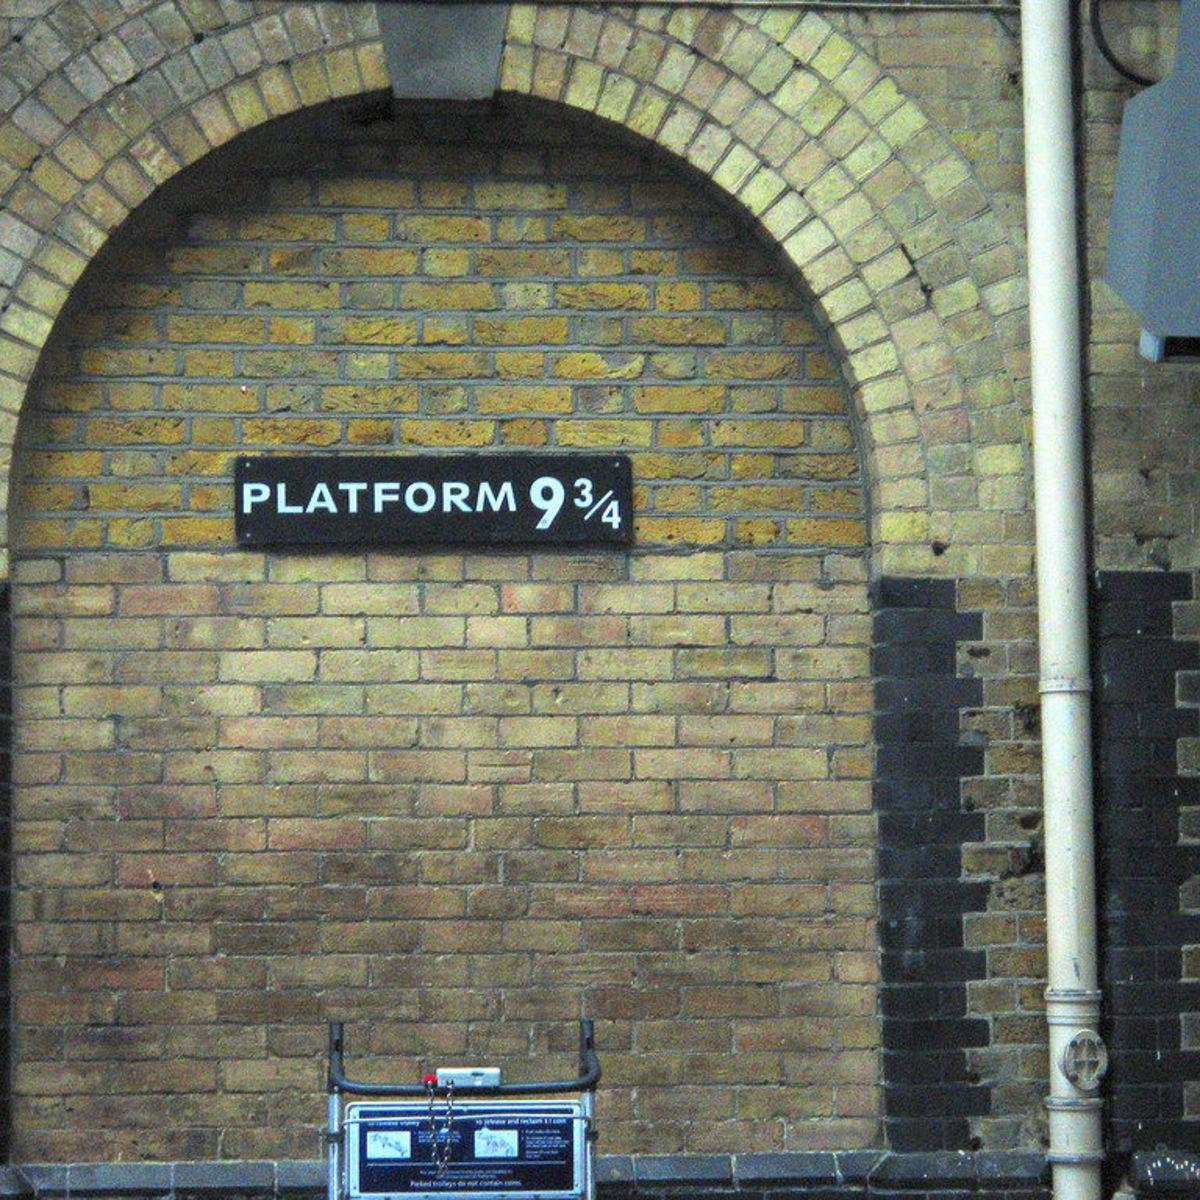 Platform 9 and three-quarters